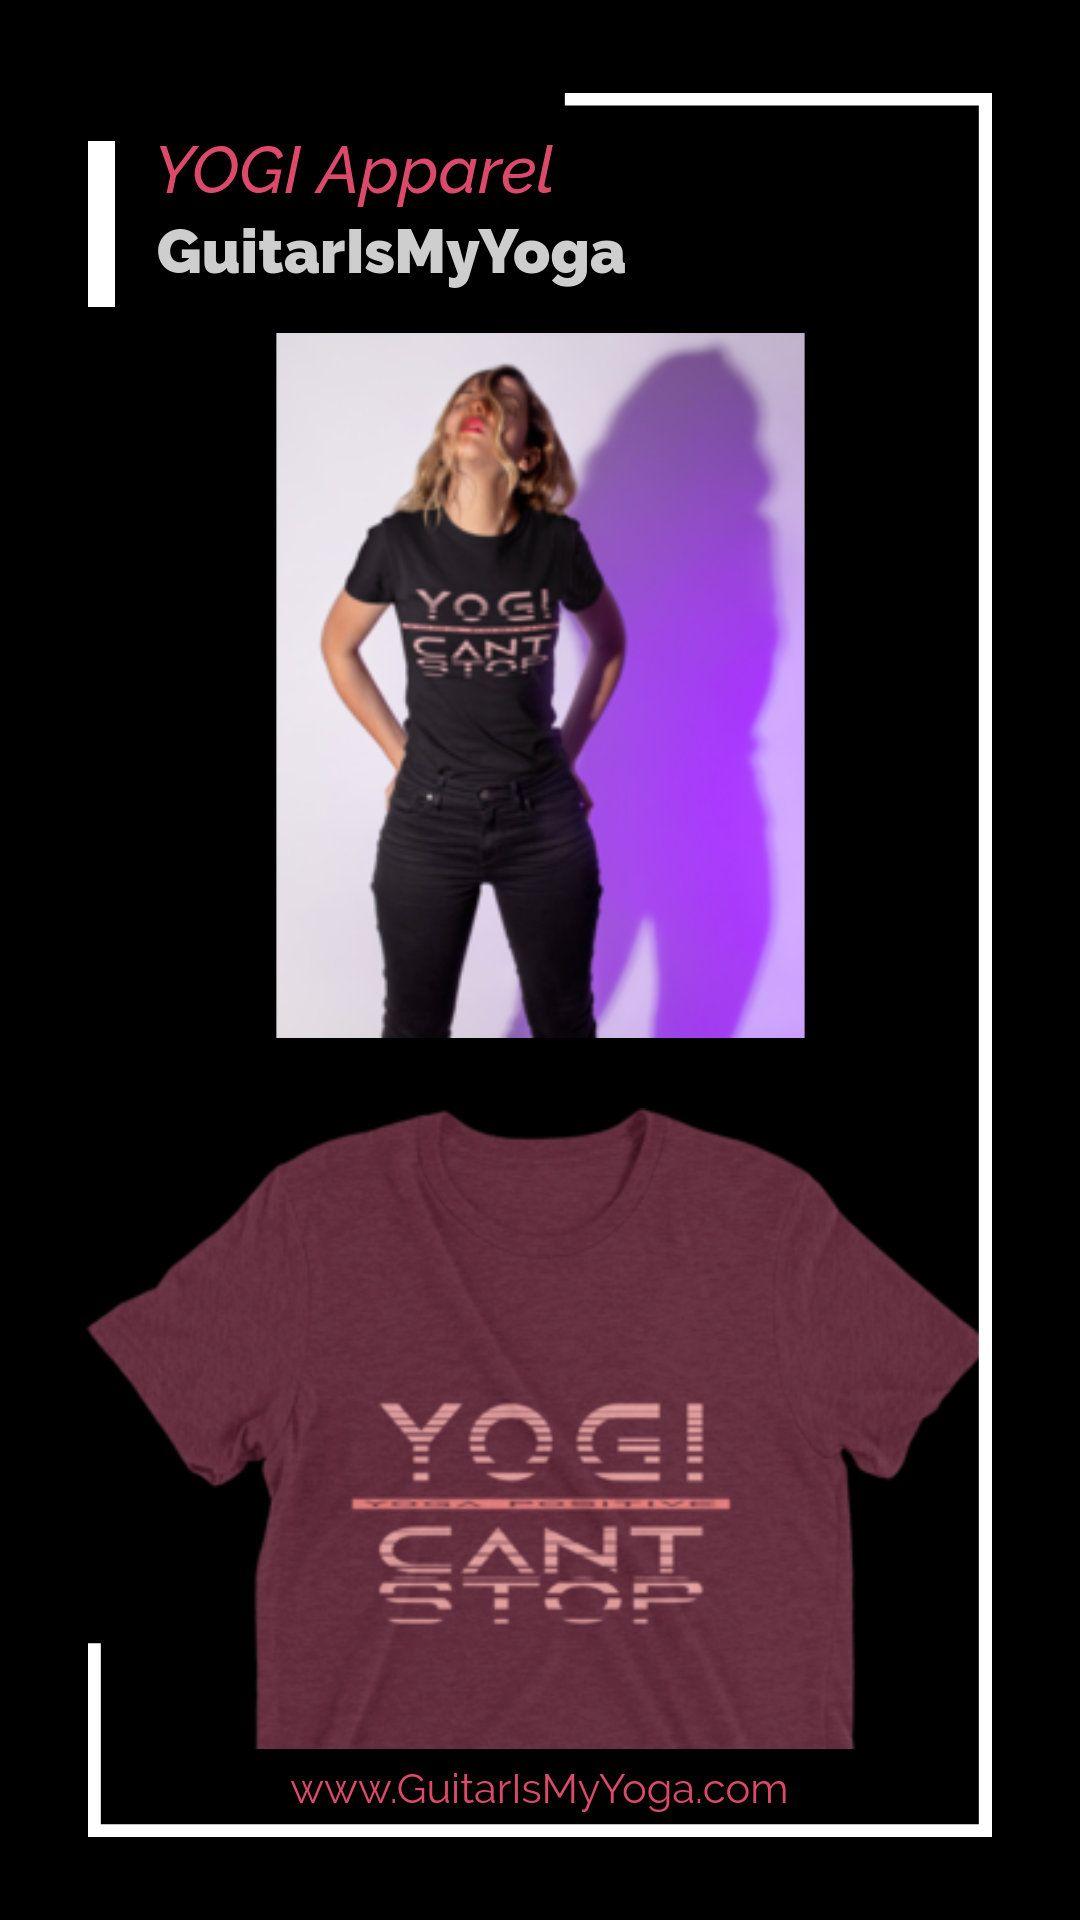 Yogi Shirt Yoga T Shirt Yoga Shirt Yoga Top Yoga Positive Quotes Yoga Clothes Yoga Shirts Urban Yoga Top In 2020 With Images Yoga Shirts Yoga Tops Yoga Clothes